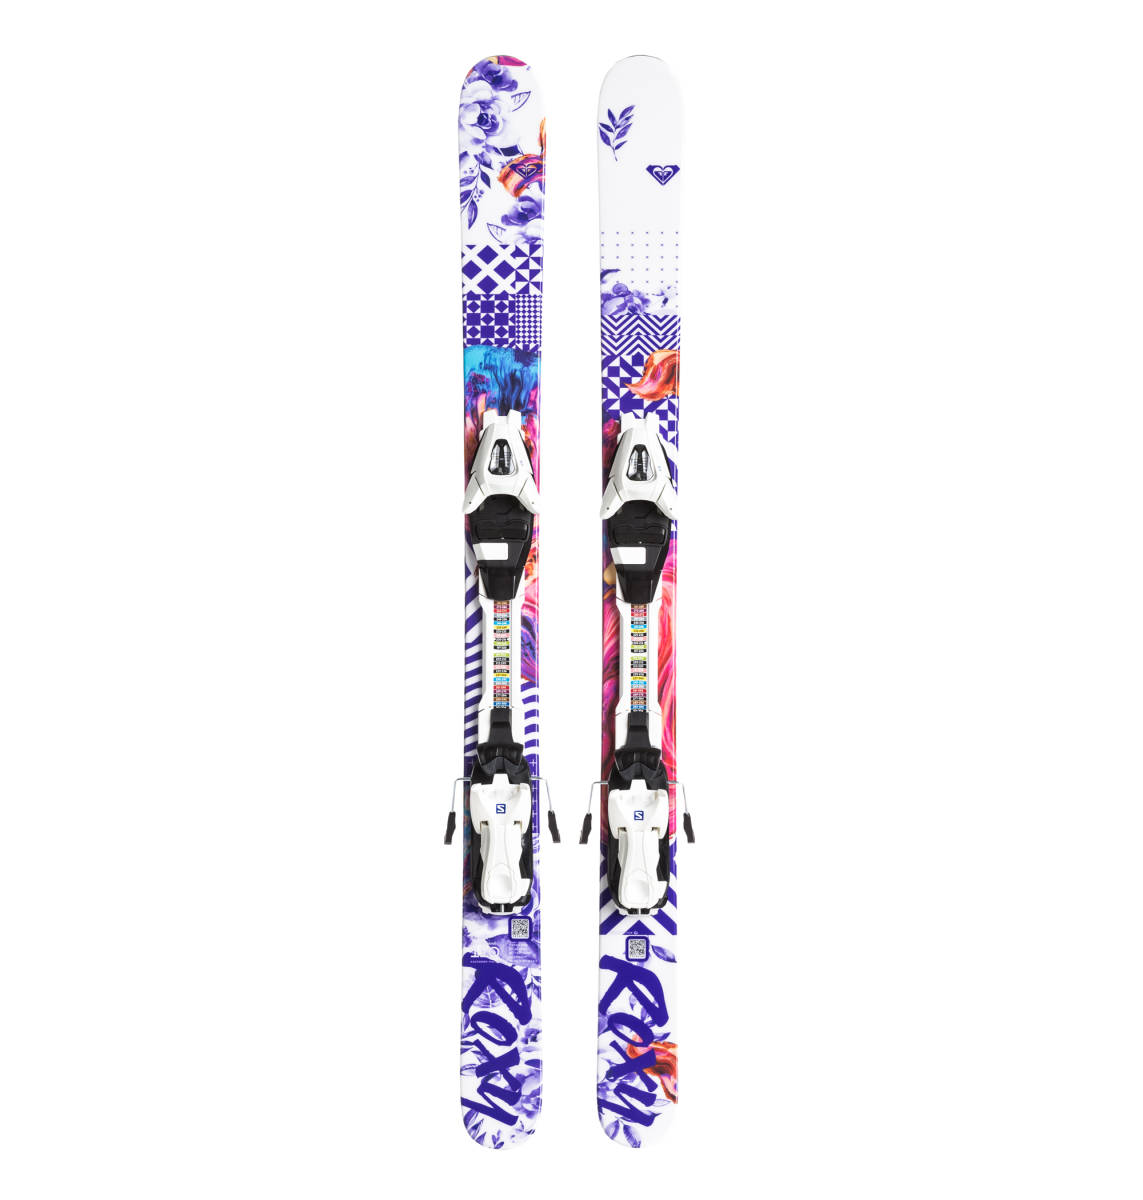 ROXY by Salomon ロキシー サロモン キッズ用 スキー板 BELLA C5 ビンディング ROXY C5 J75付 110cm_画像1